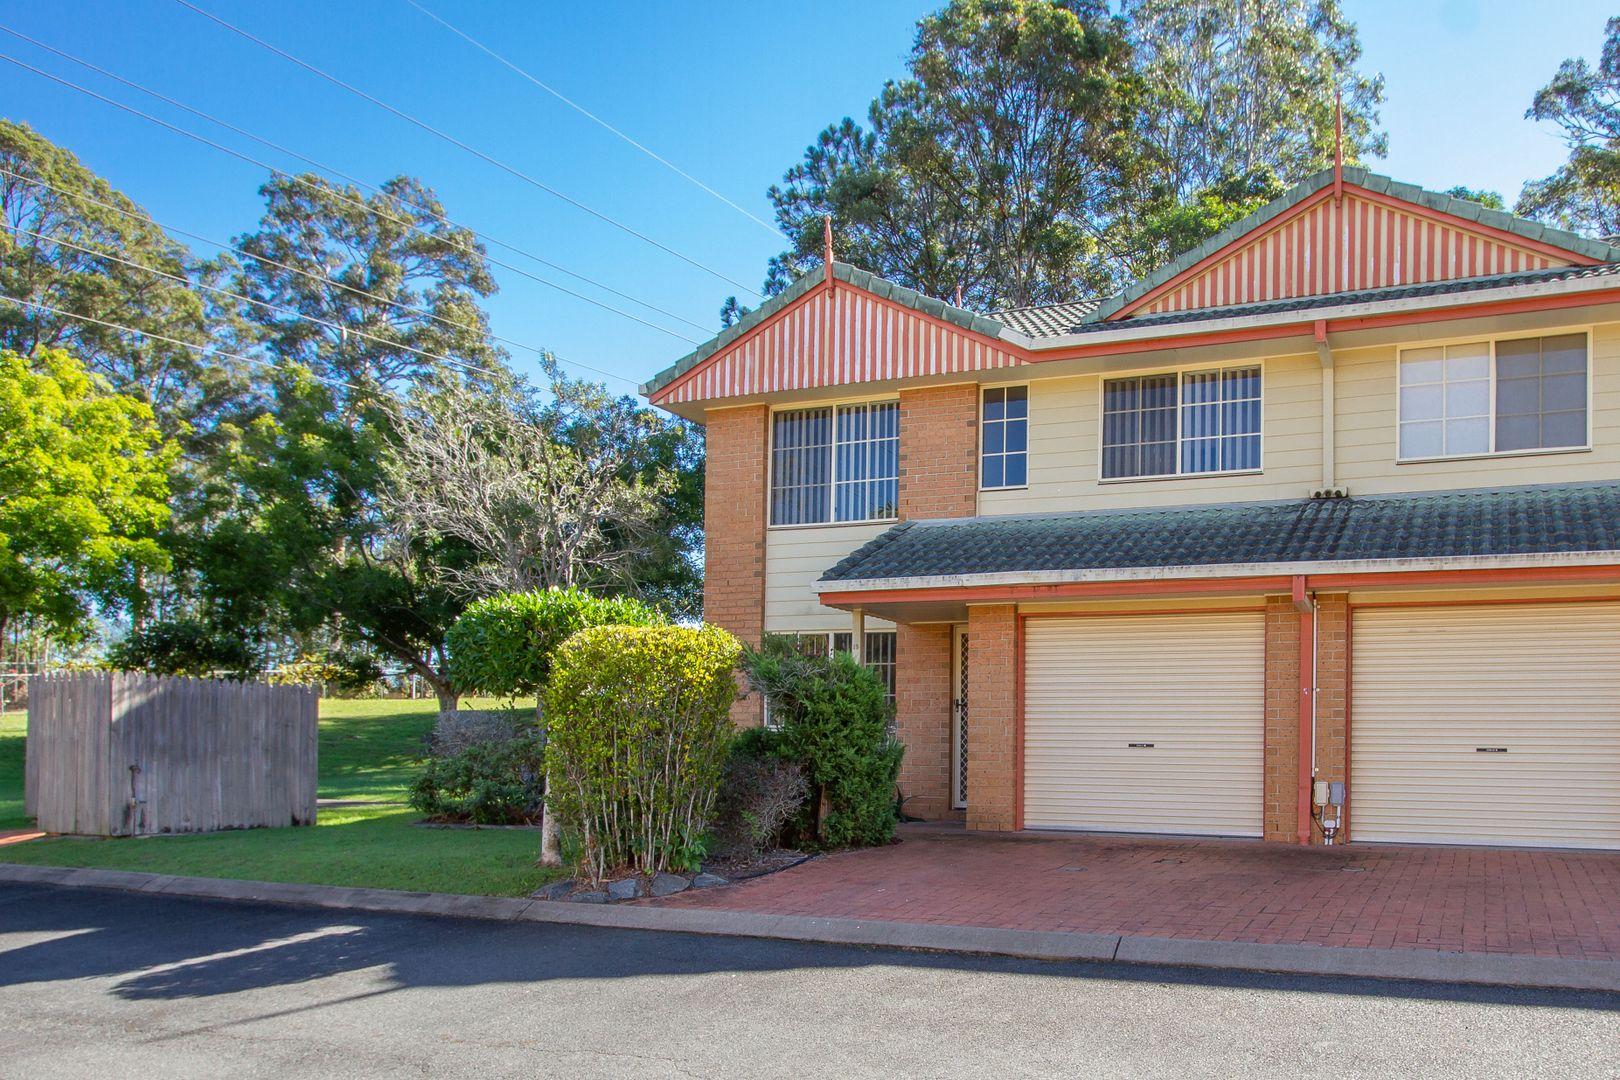 19/125 Chatswood Road, Daisy Hill QLD 4127, Image 0